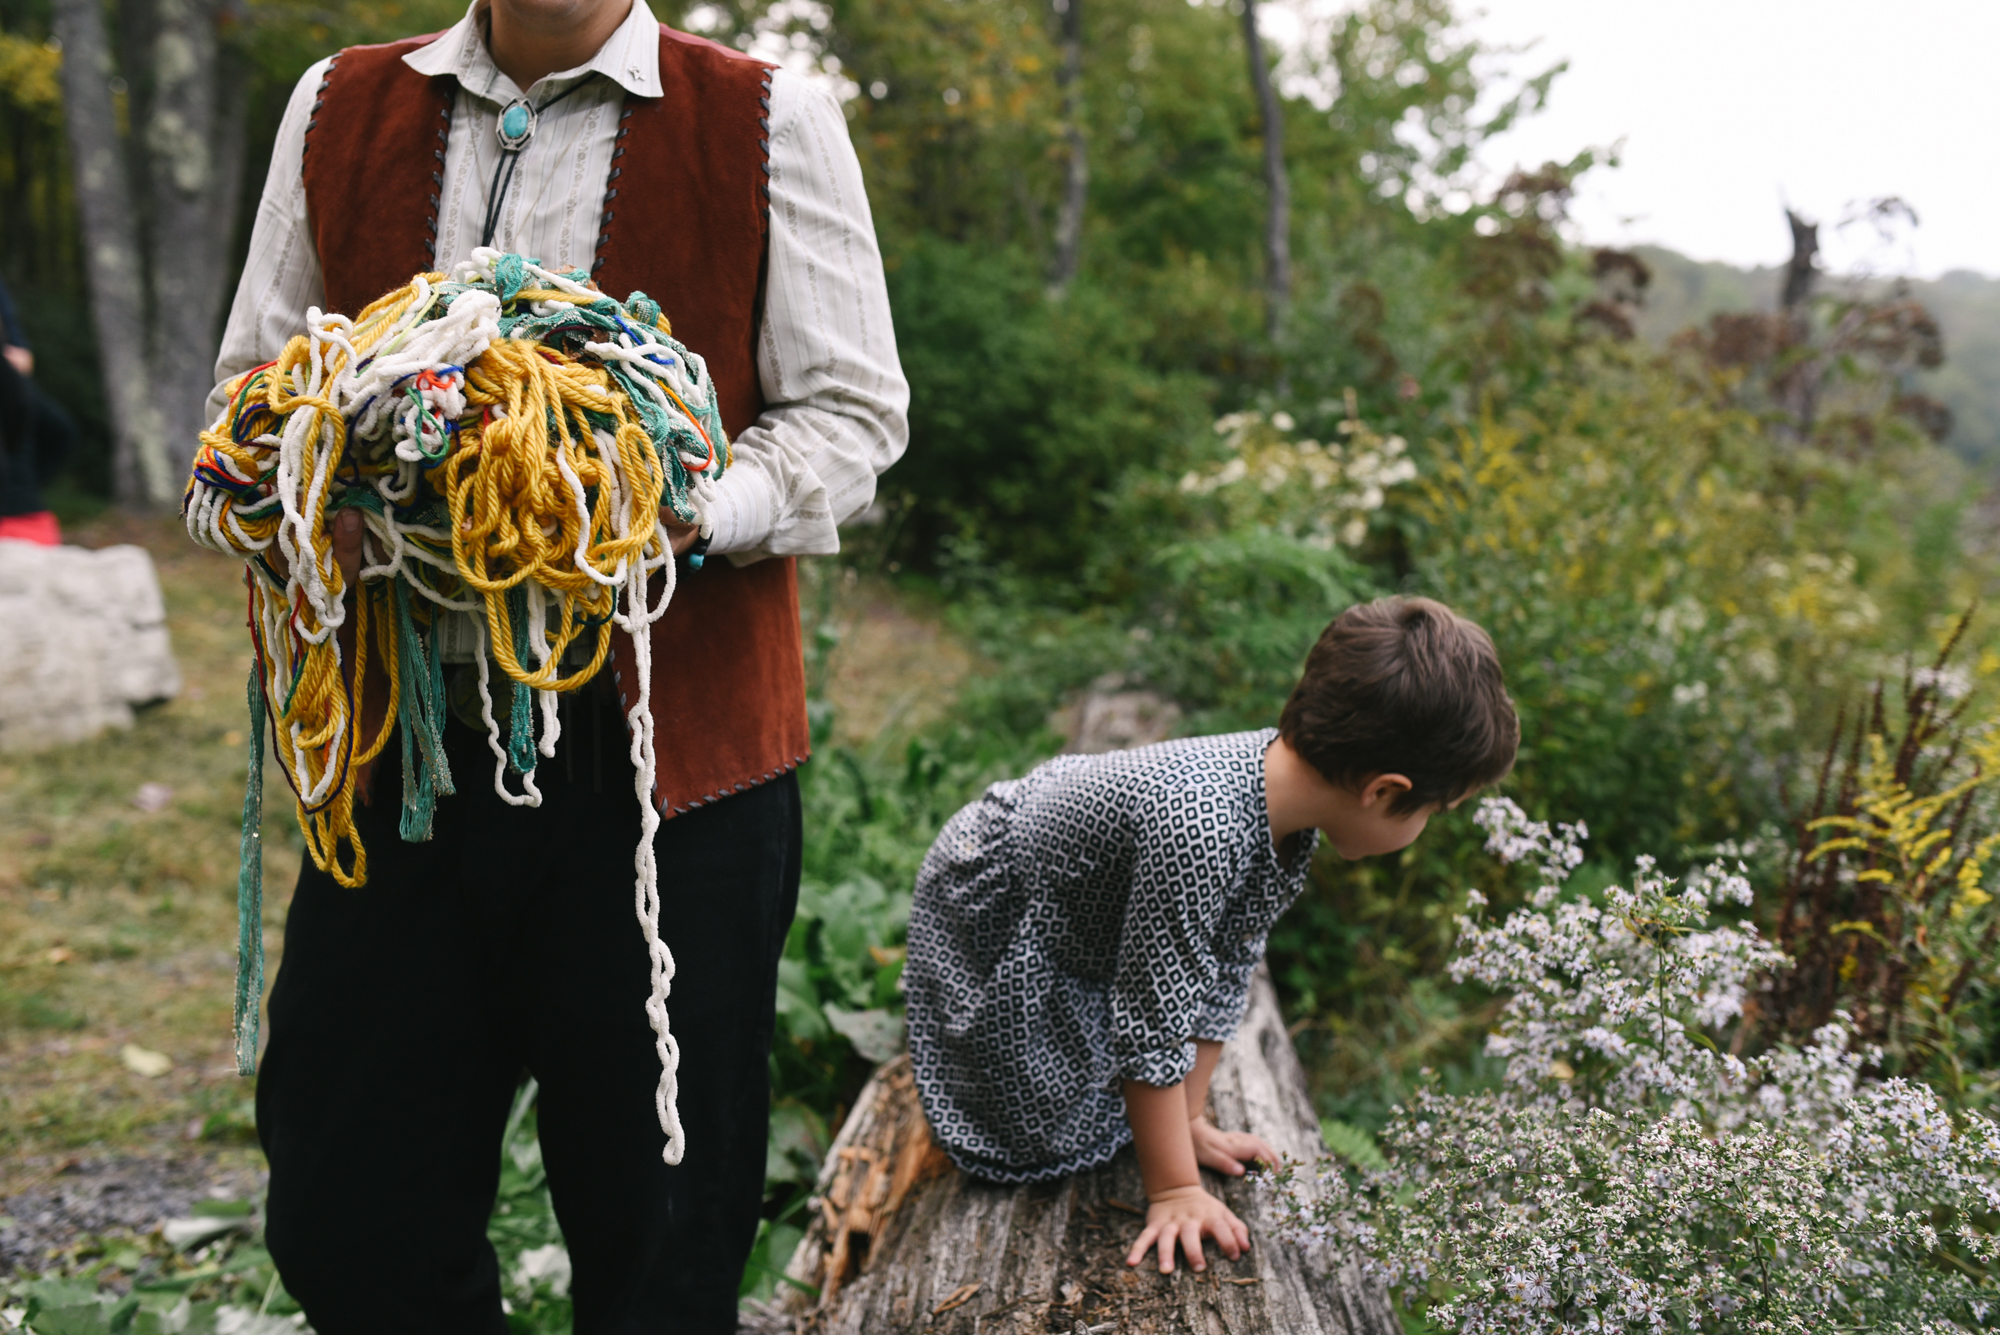 Mountain Wedding, Outdoors, Rustic, West Virginia, Maryland Wedding Photographer, DIY, Casual, groom gathering yarn with little girl